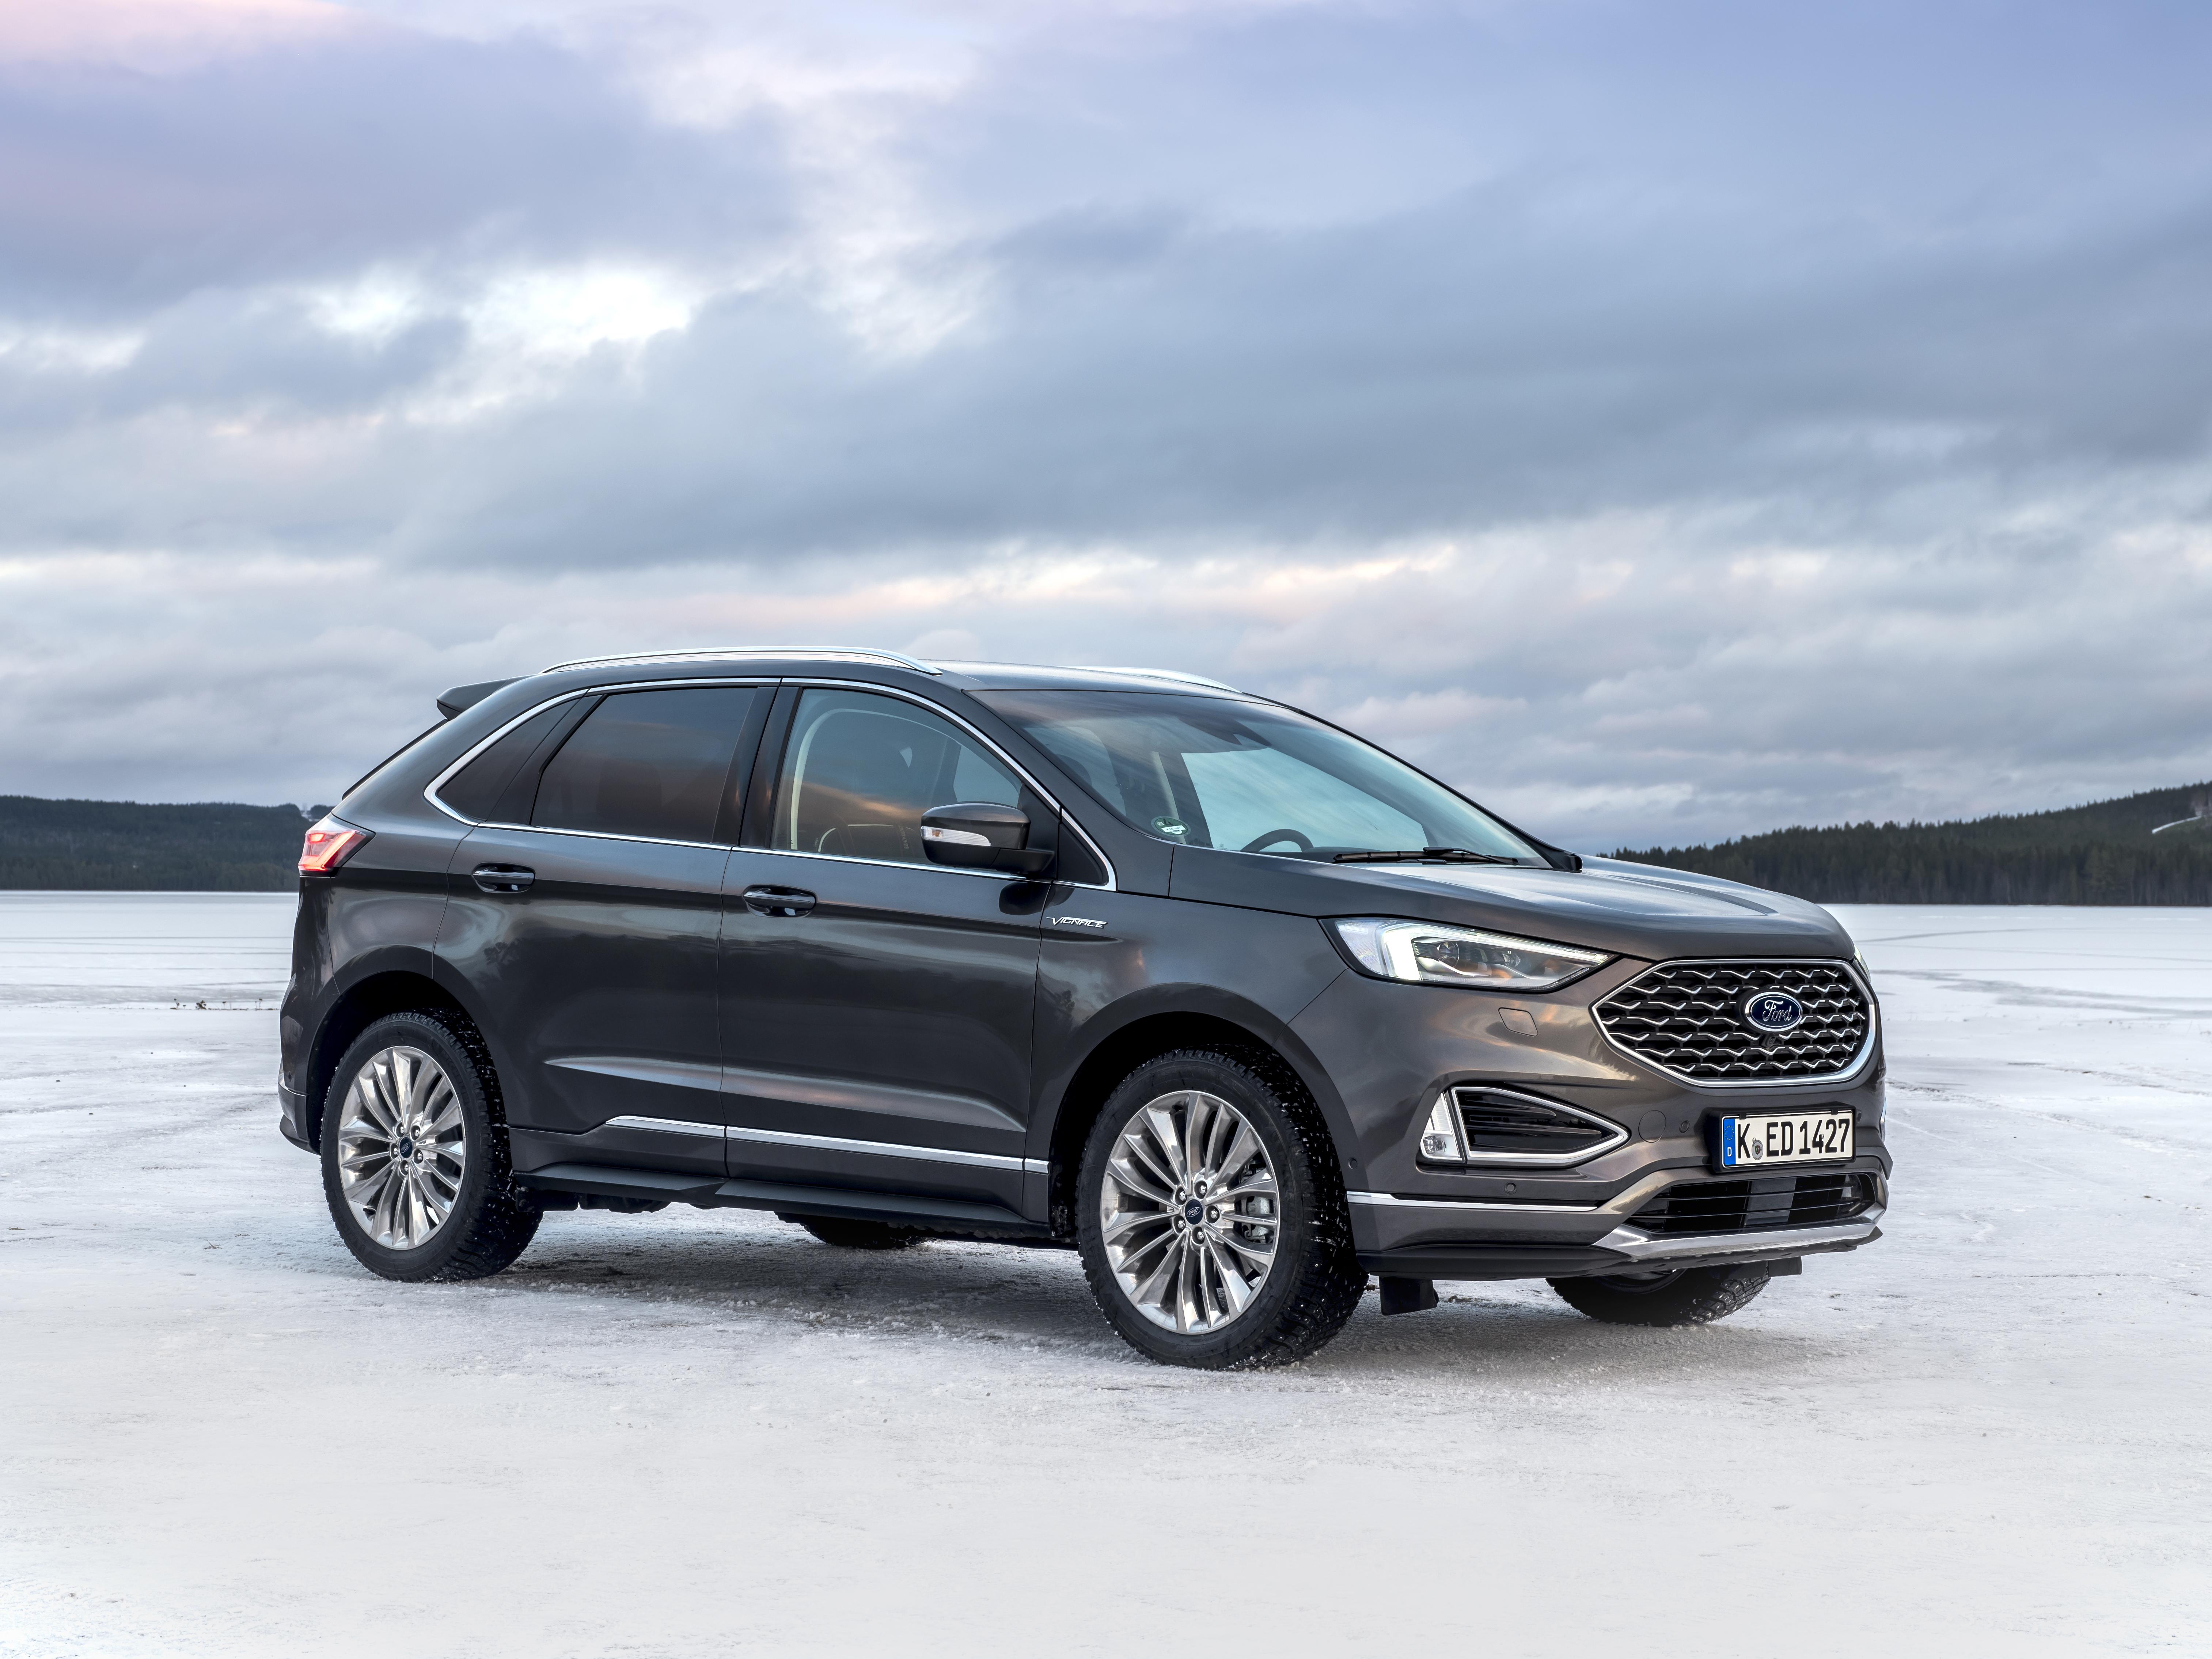 Adas nuova Ford Edge 2019